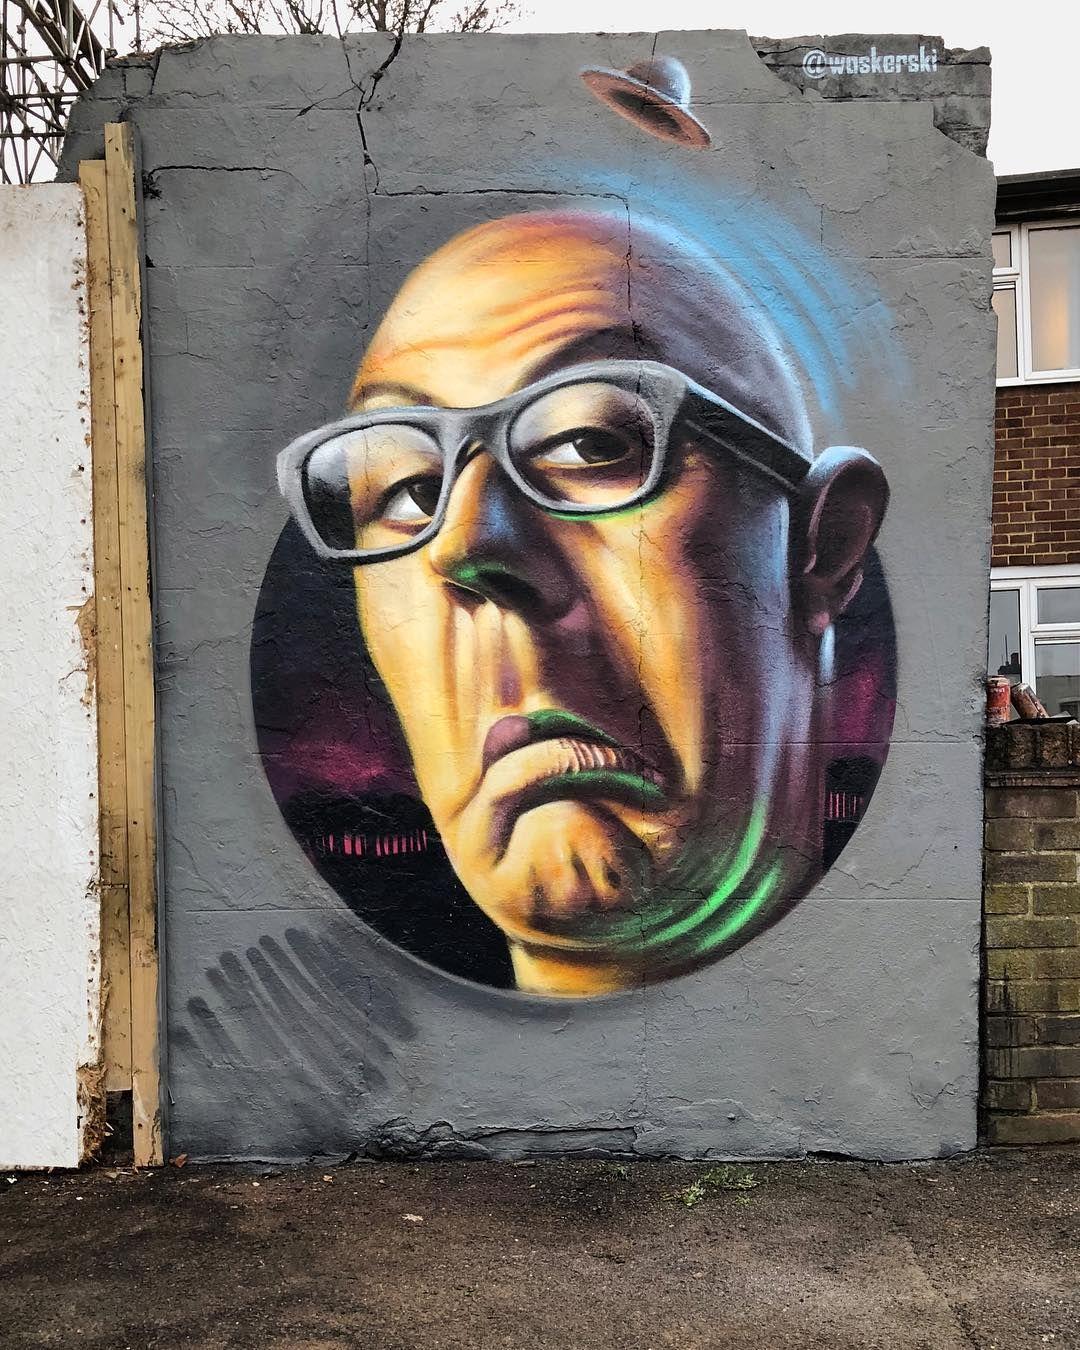 Graffiti Tagging Graffiti Art Amazing Street Art 3D Street Art Street Artists